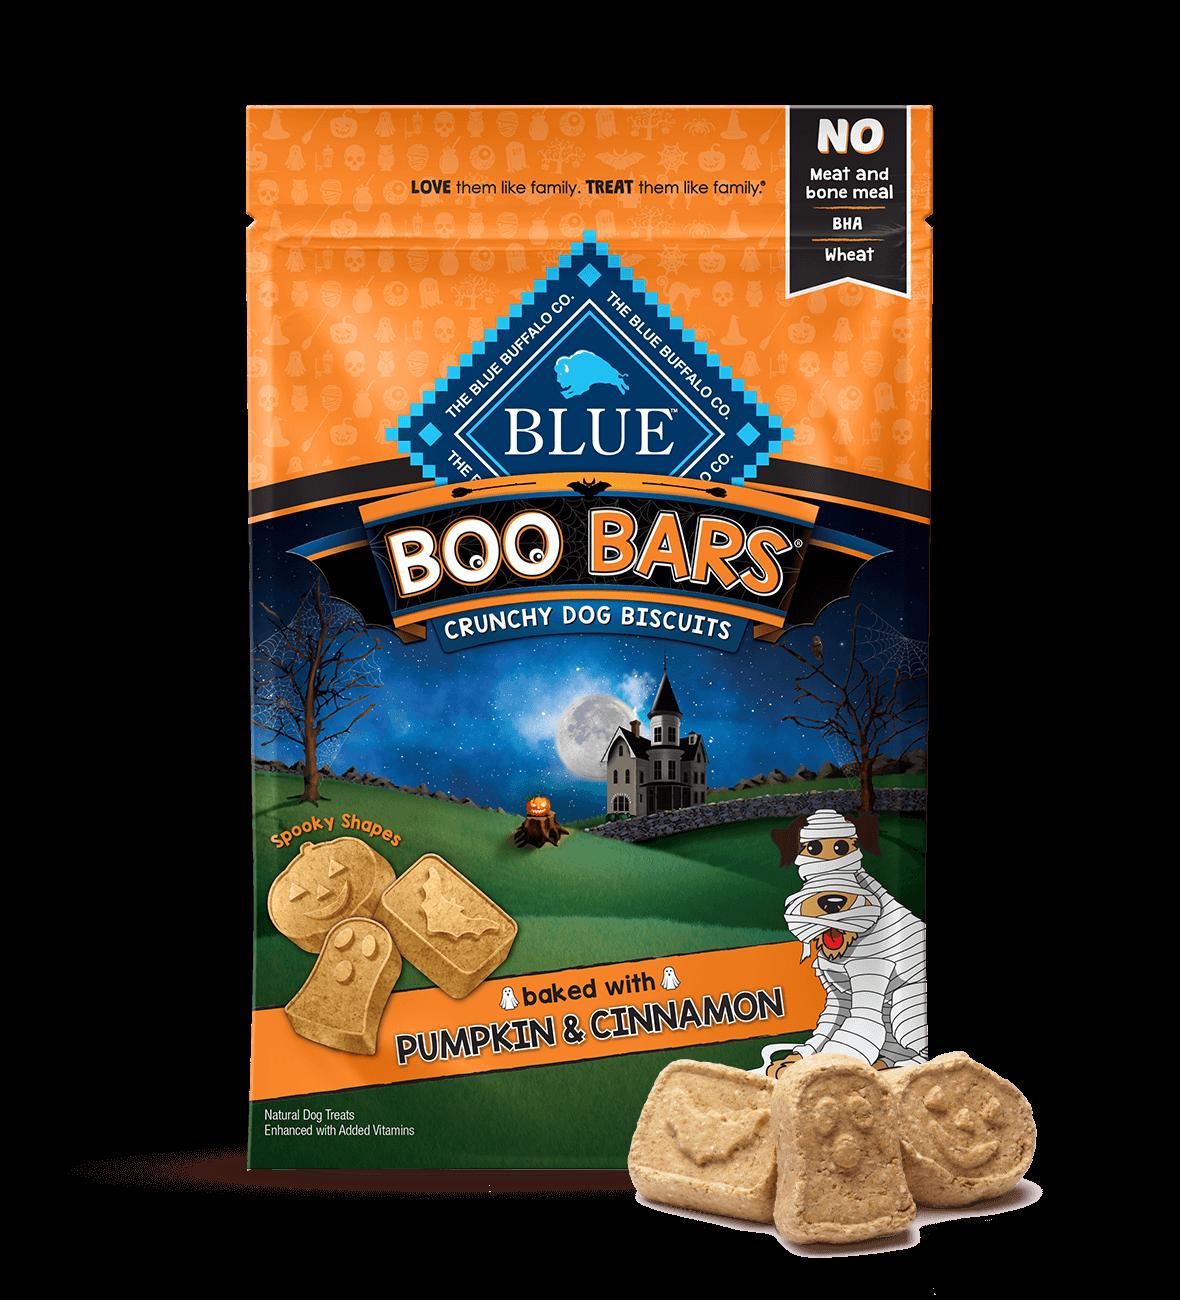 Blue Buffalo Boo Bars Pumpkin & Cinnamon Crunchy Biscuits Dog Treats, 8-oz